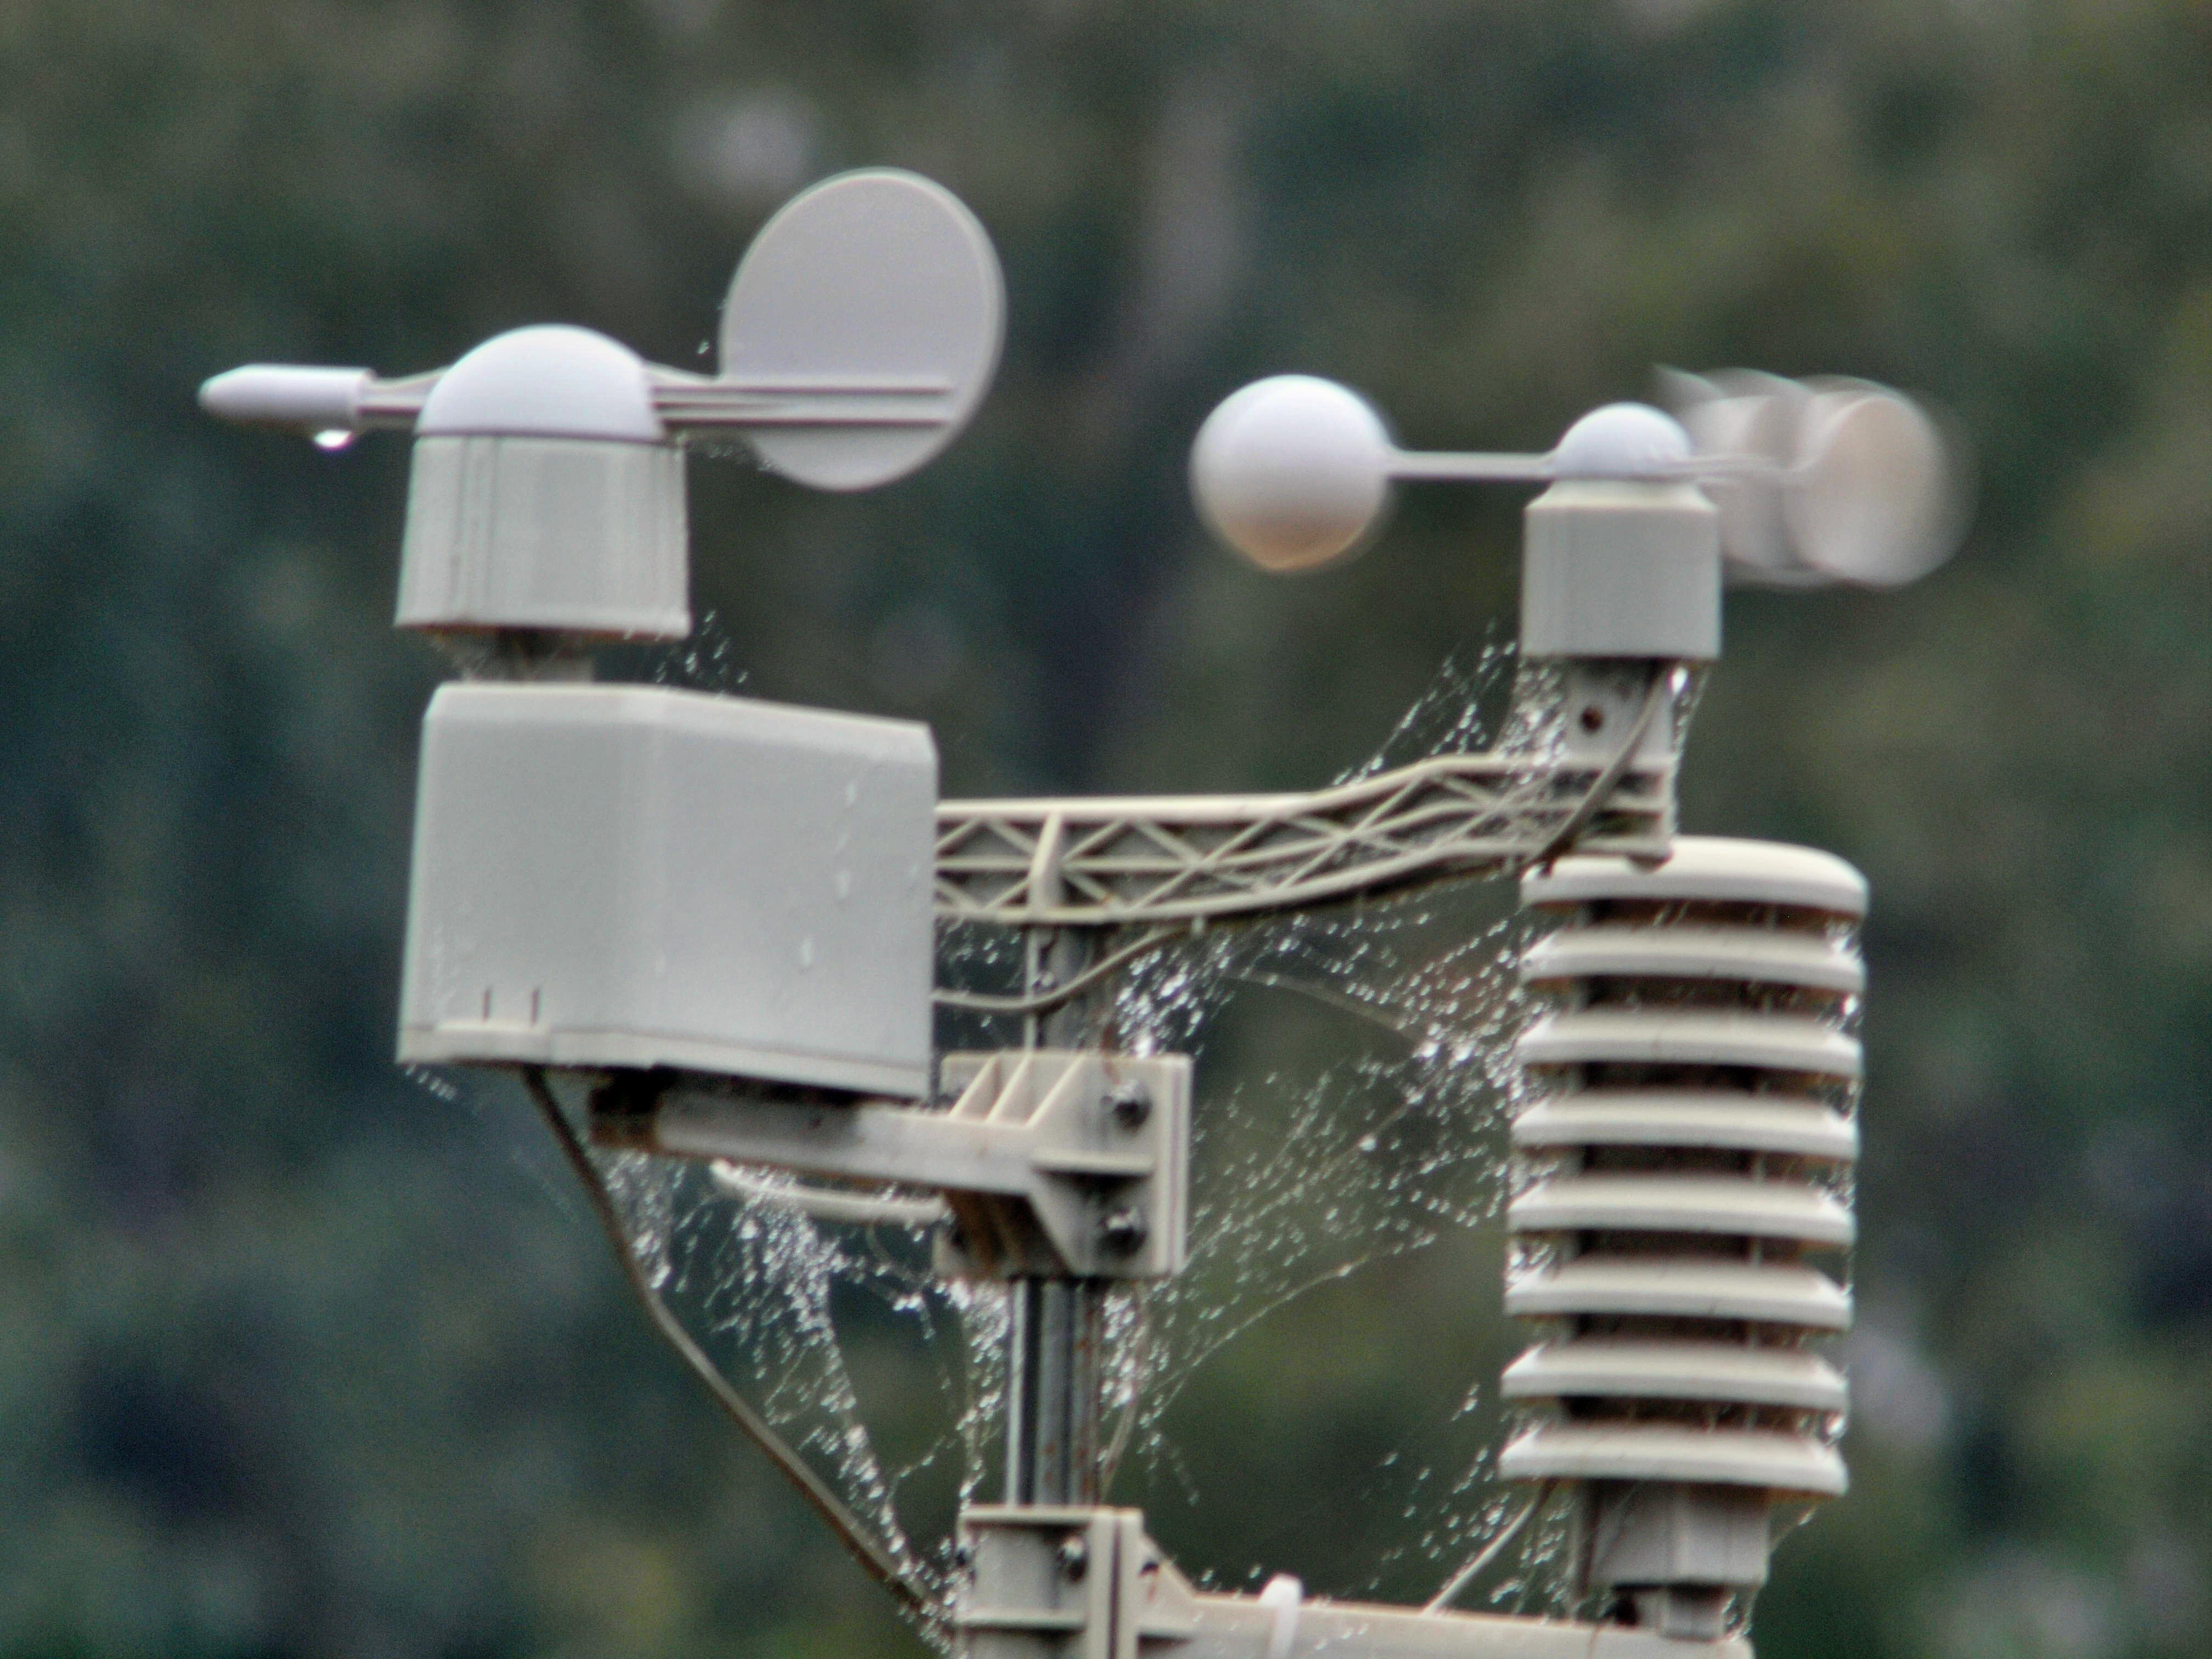 Weather-station-Hanimex-600mm-11-unstabilized.jpeg